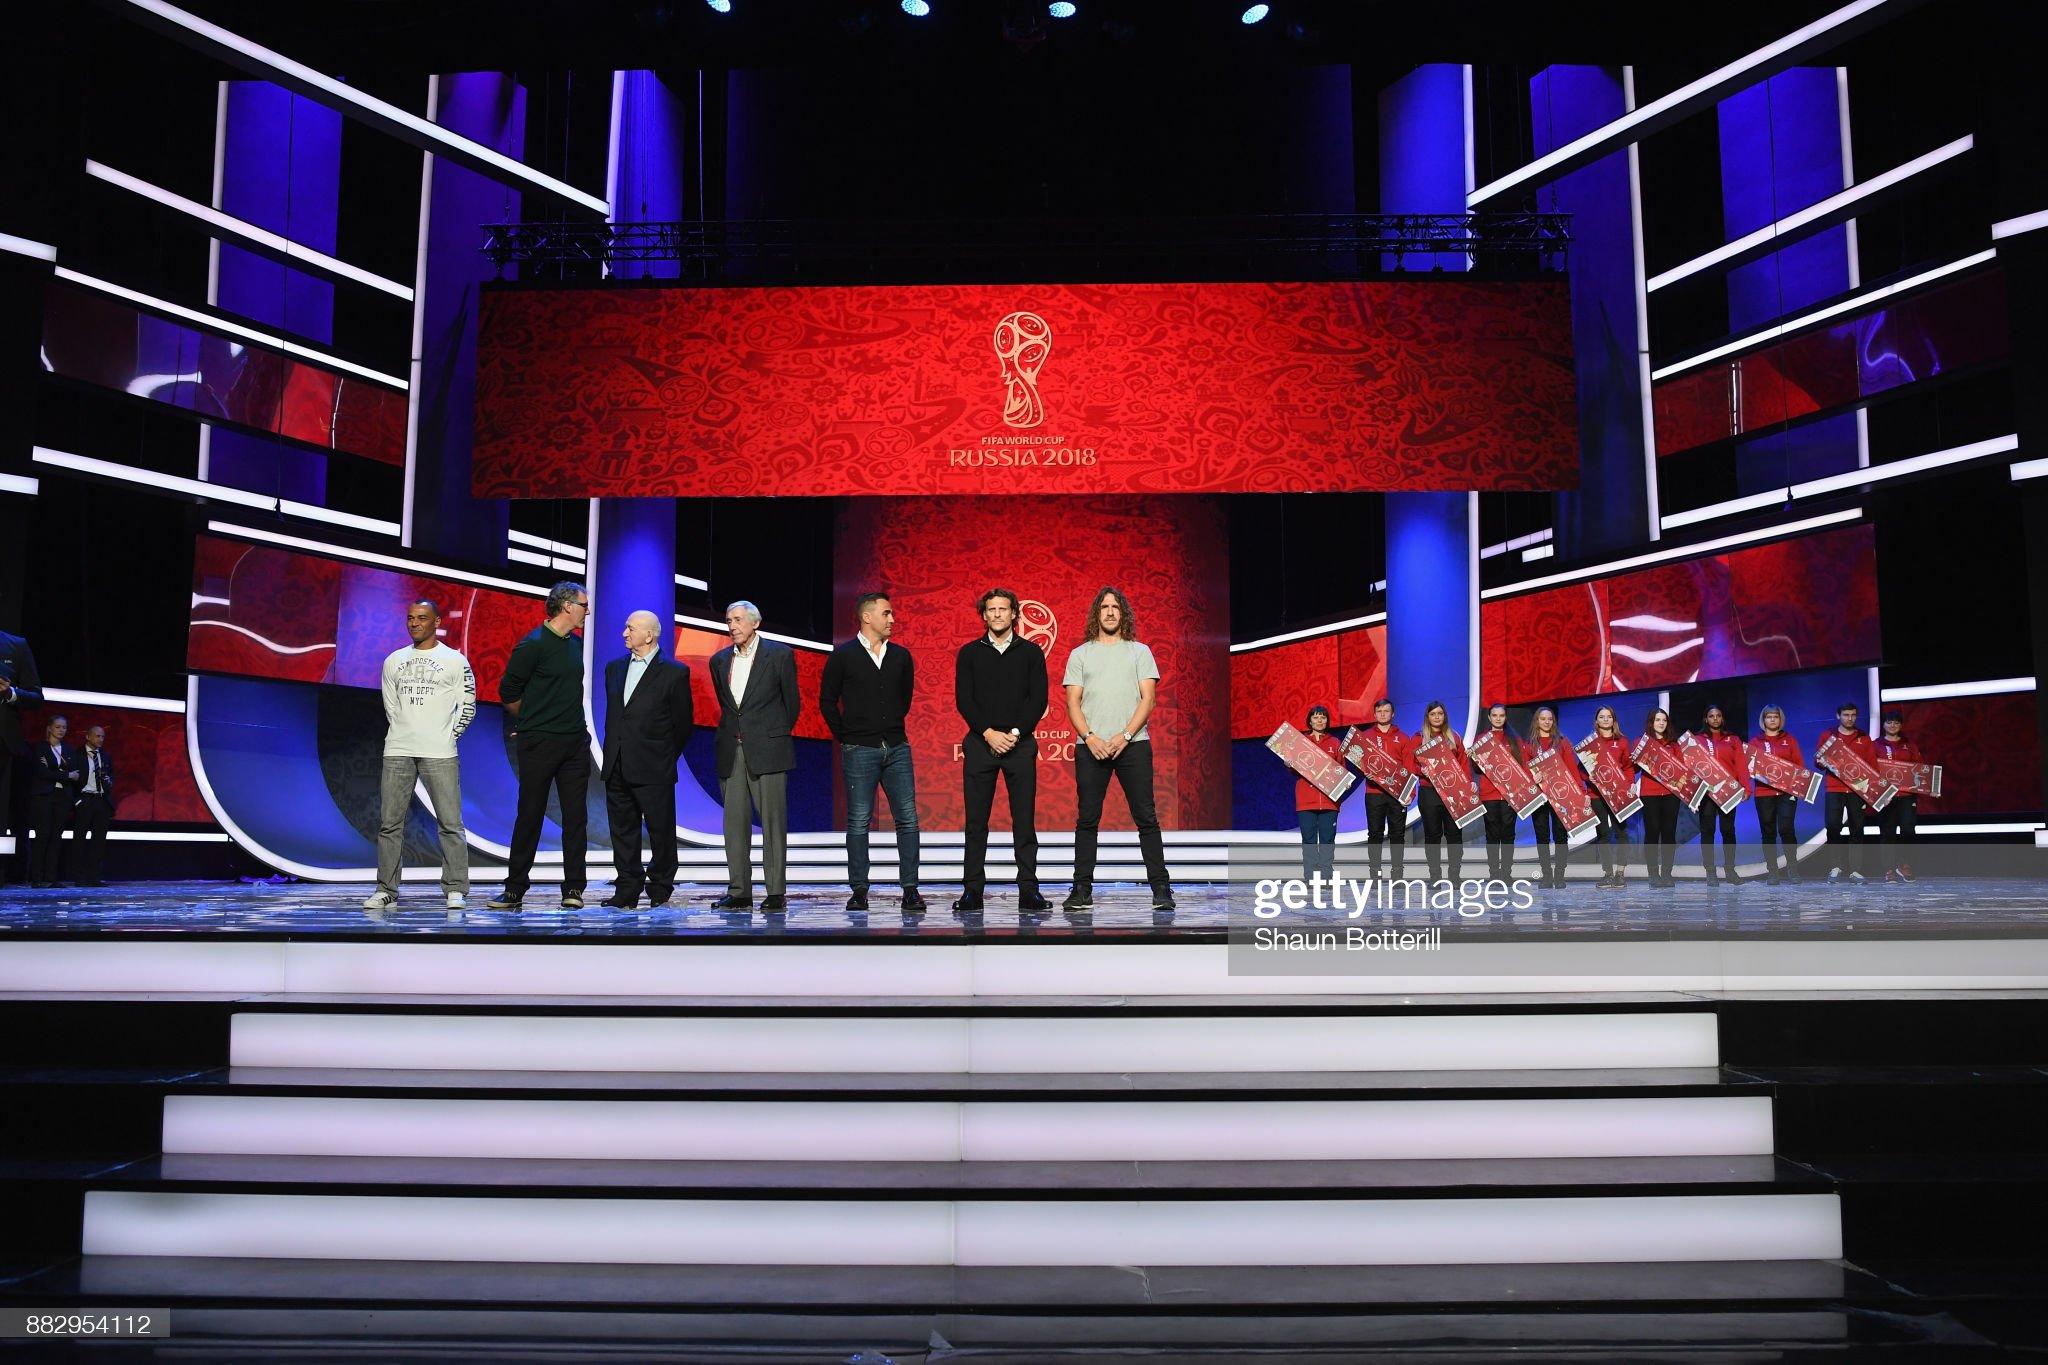 ¿Cuánto mide Carles Puyol? - Altura - Real height - Página 4 Cafu-laurent-blanc-nikita-simonyan-gordon-banks-fabio-cannavaro-diego-picture-id882954112?s=2048x2048